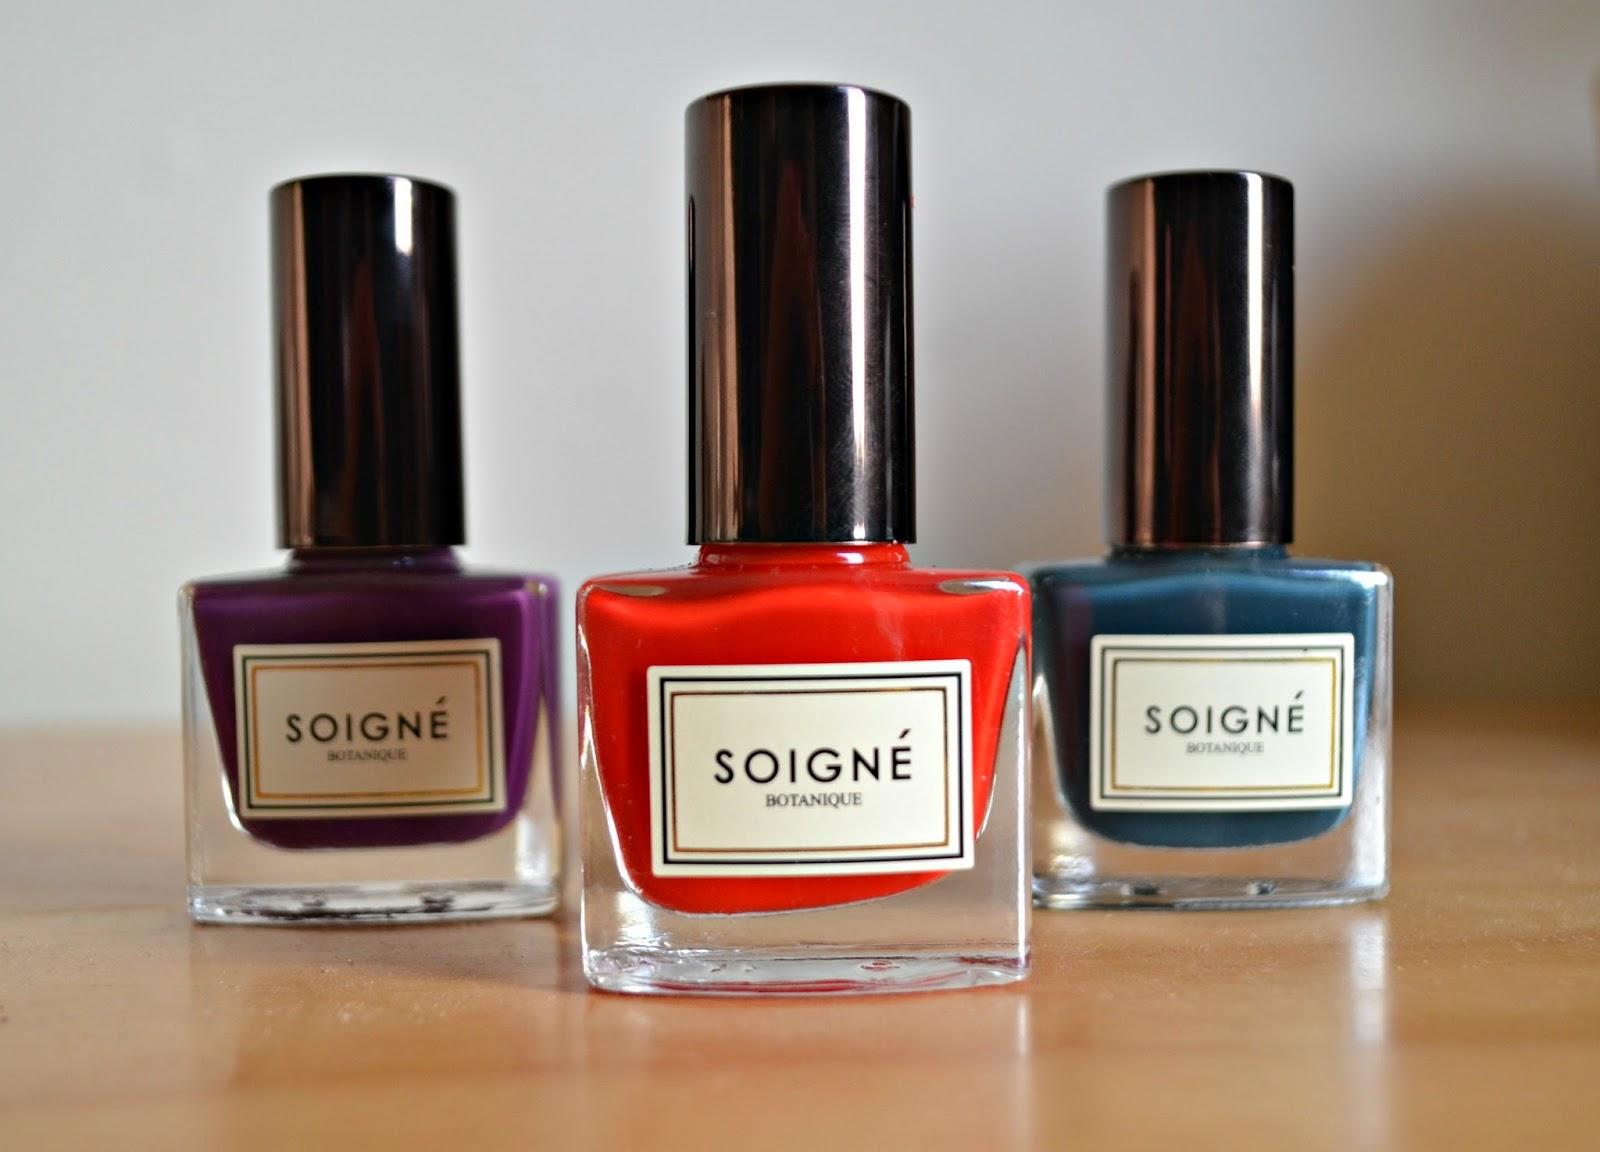 Soigne Botanique Plant-Based, Eco-Friendly Nail Polish